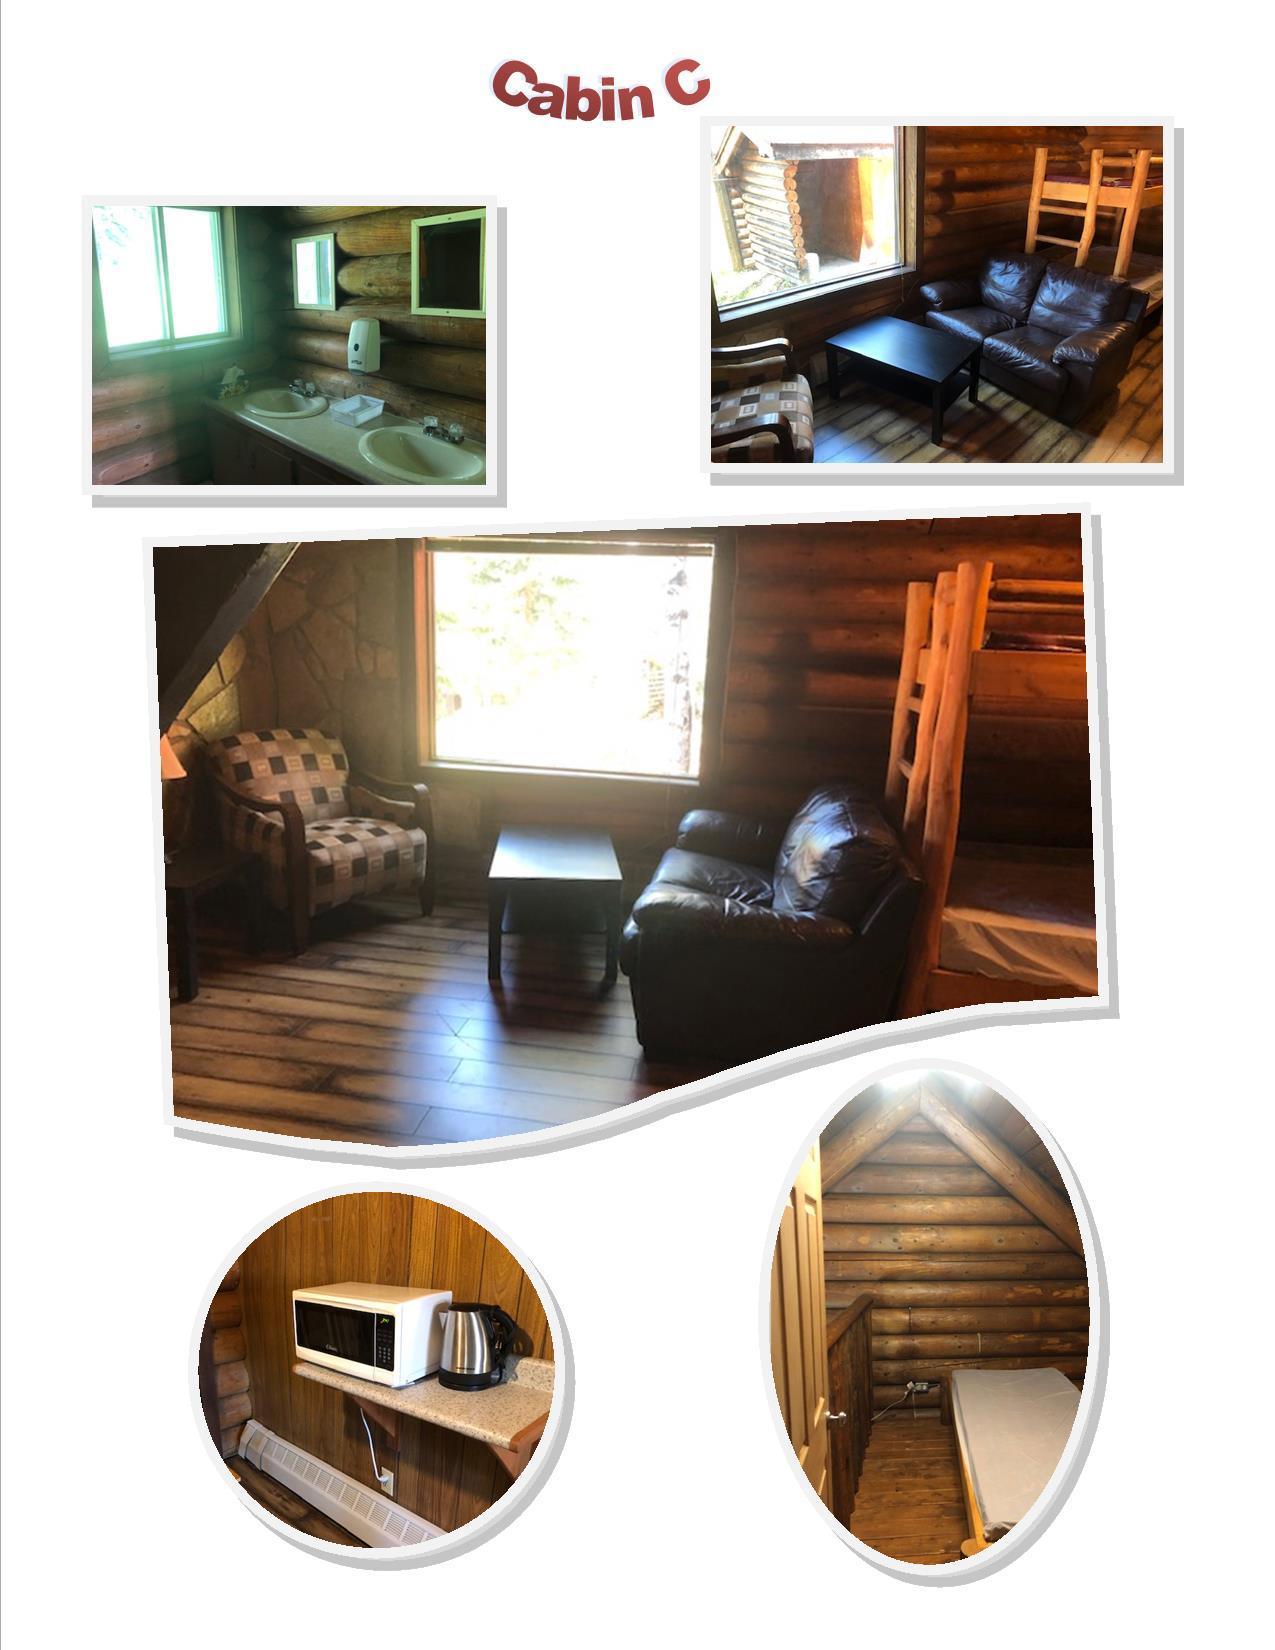 Cabin Rentals Cabin C